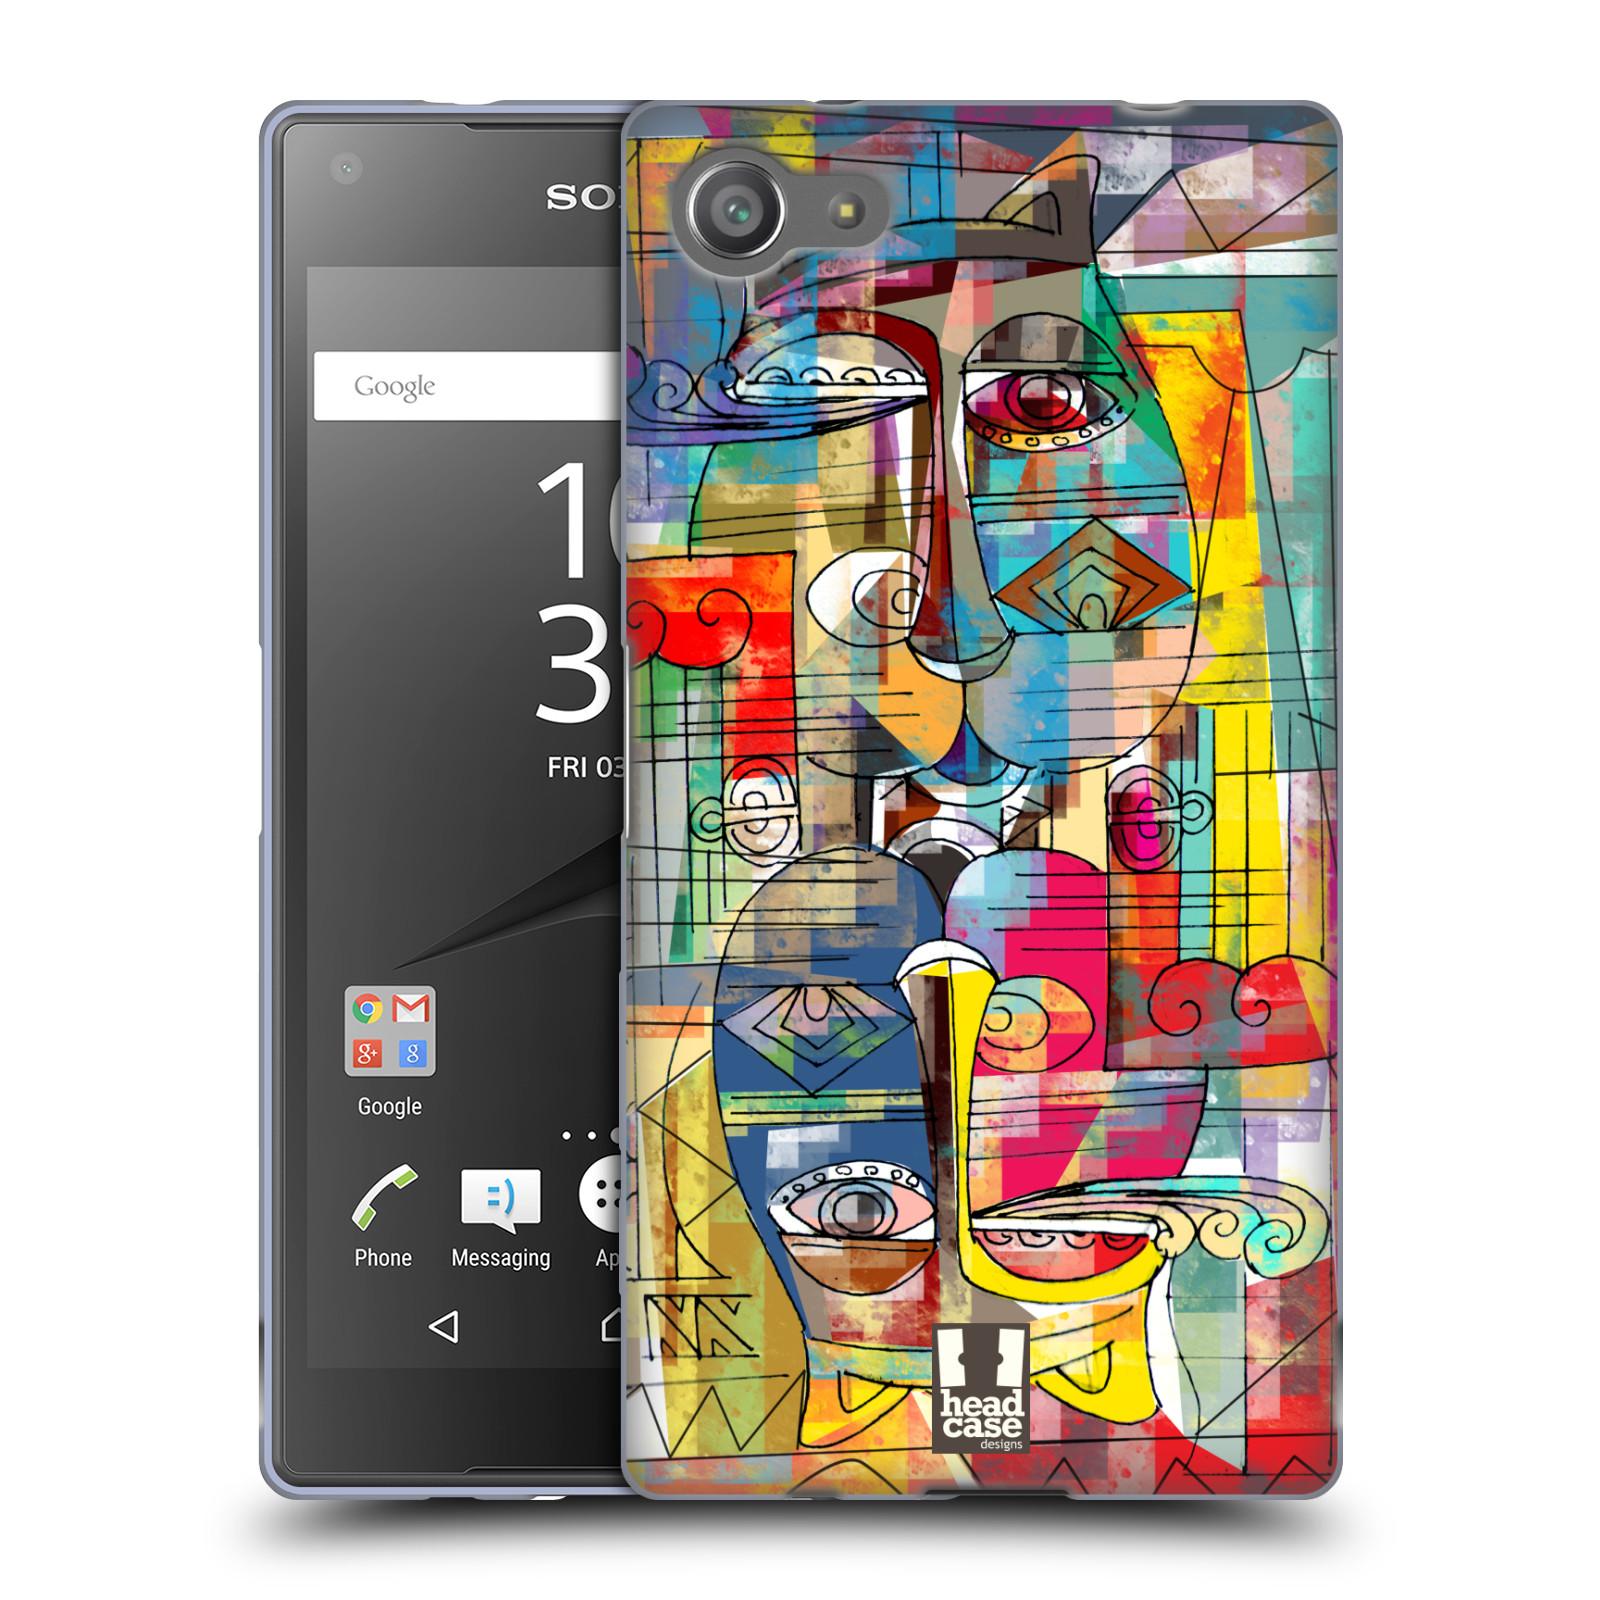 Silikonové pouzdro na mobil Sony Xperia Z5 Compact HEAD CASE AZTEC MANX